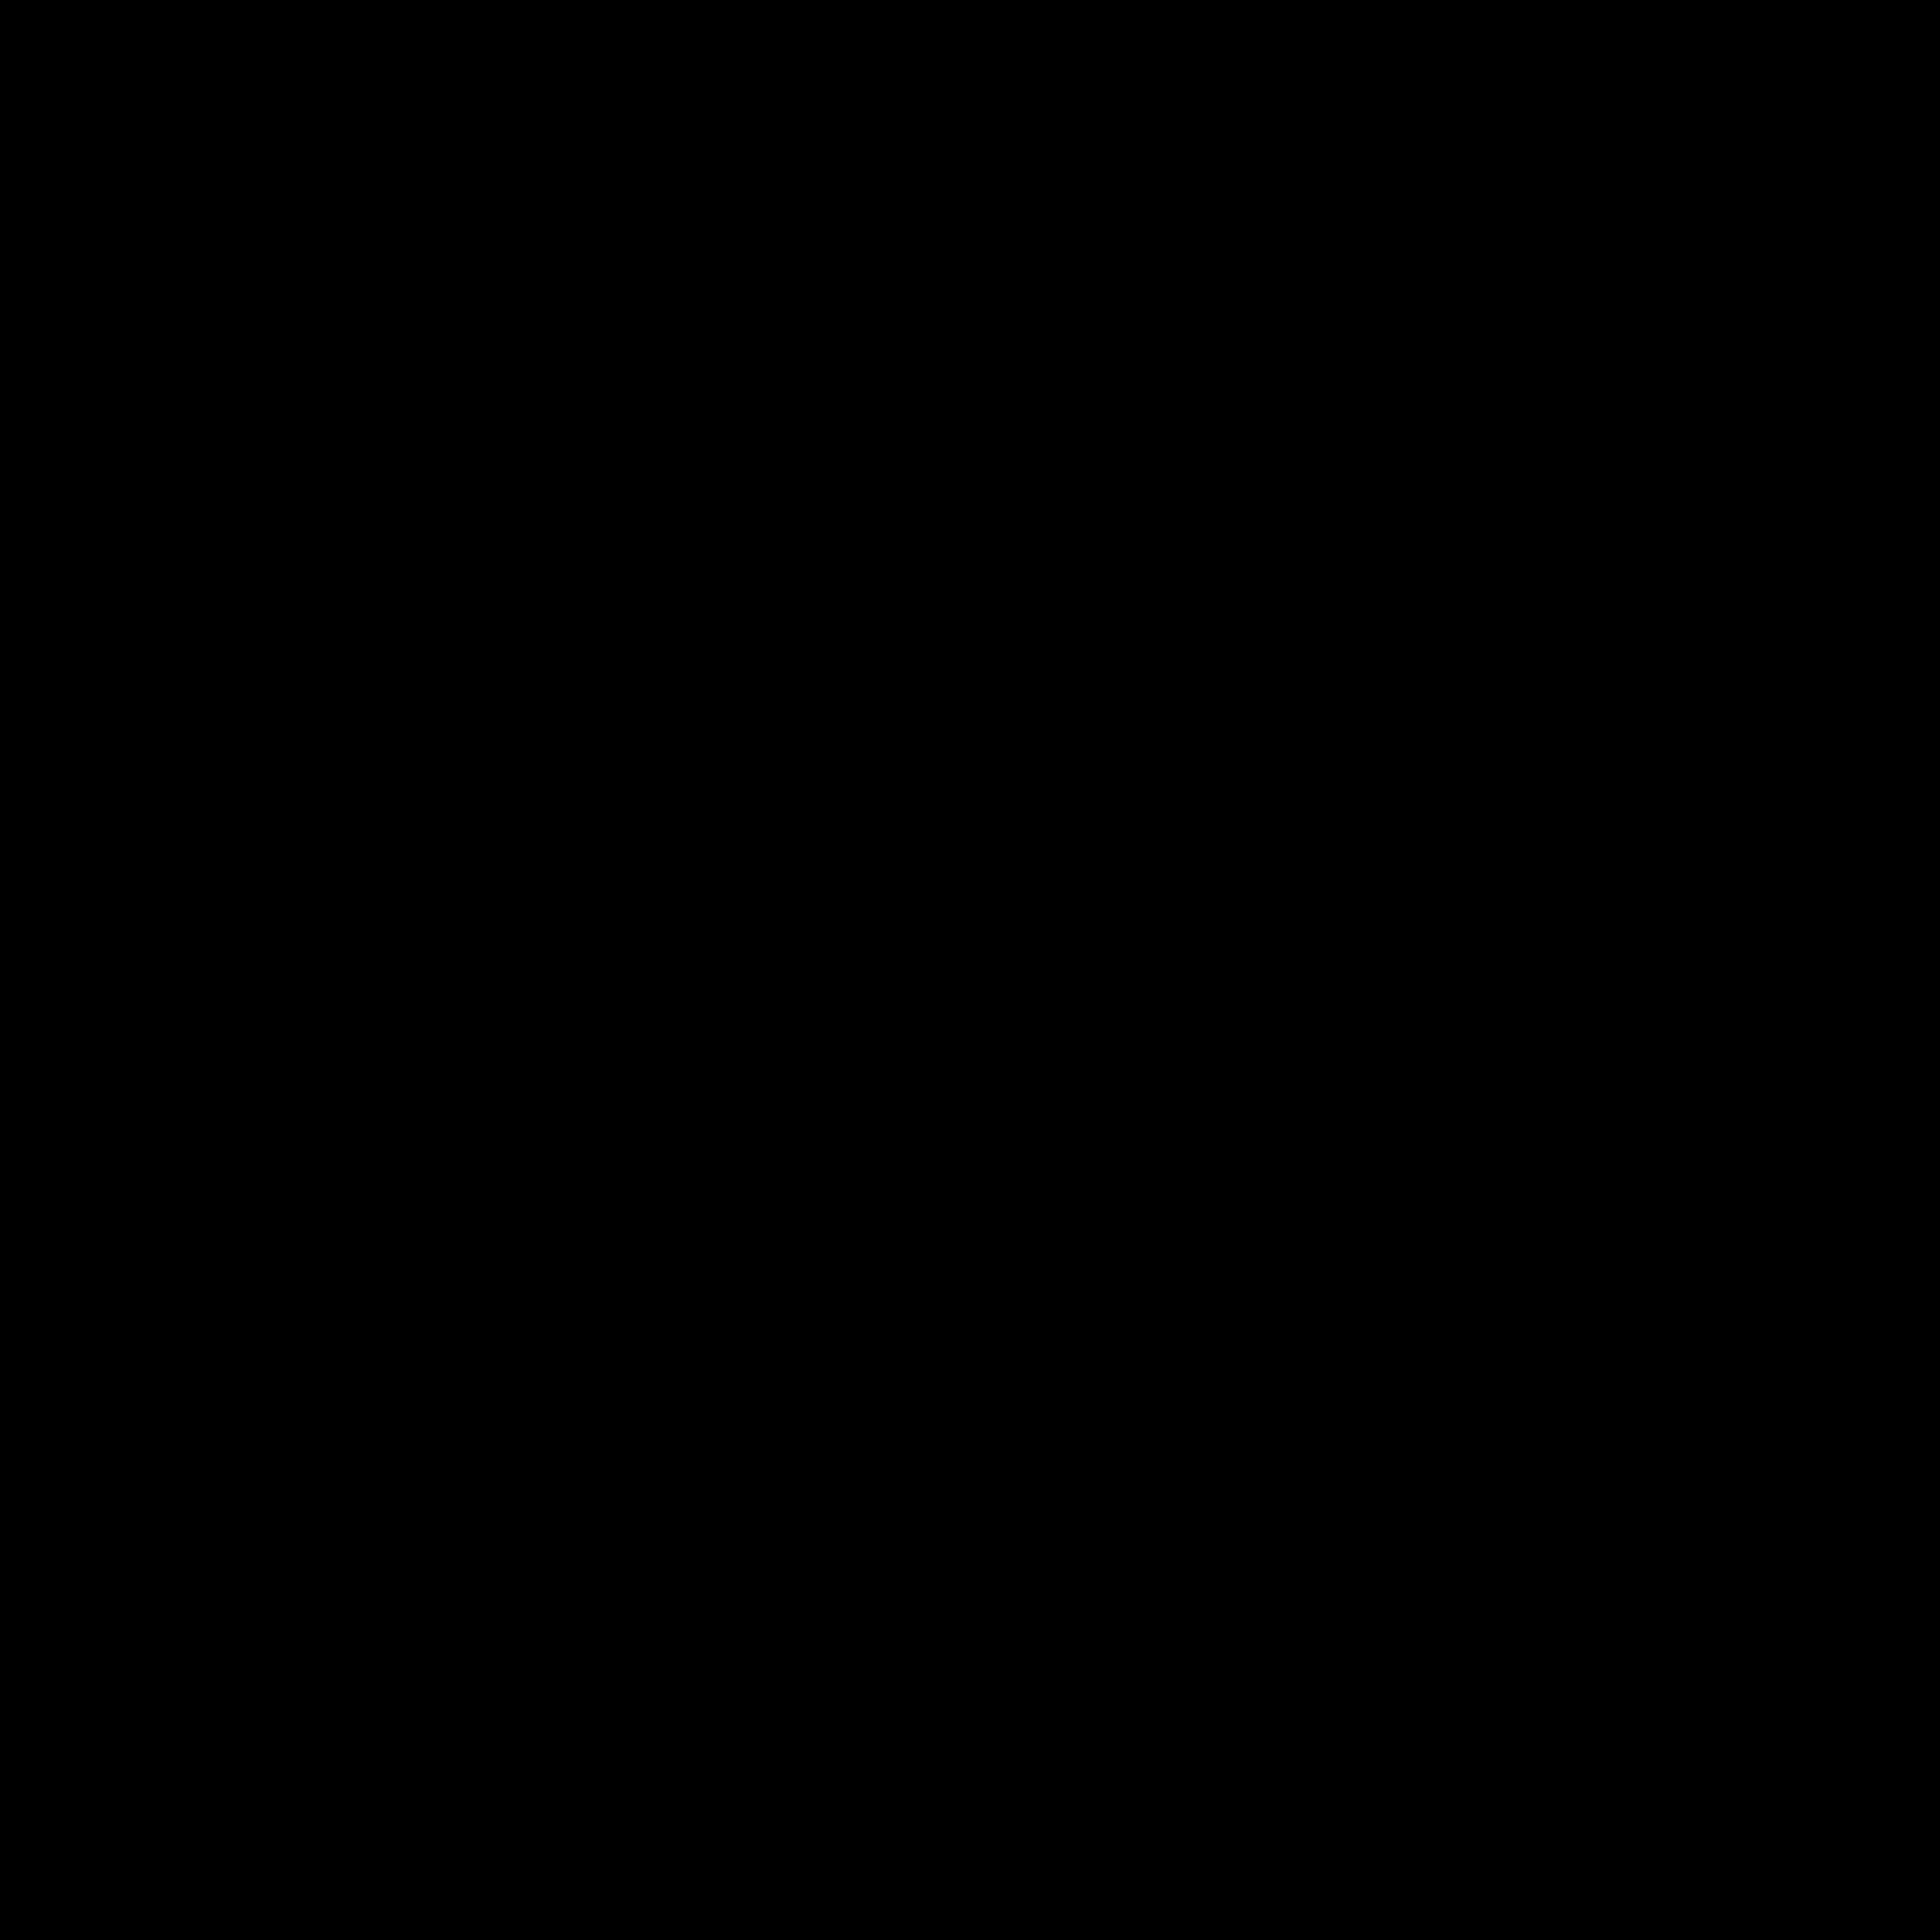 2000x2000 Filewoman Silhouette 51.svg